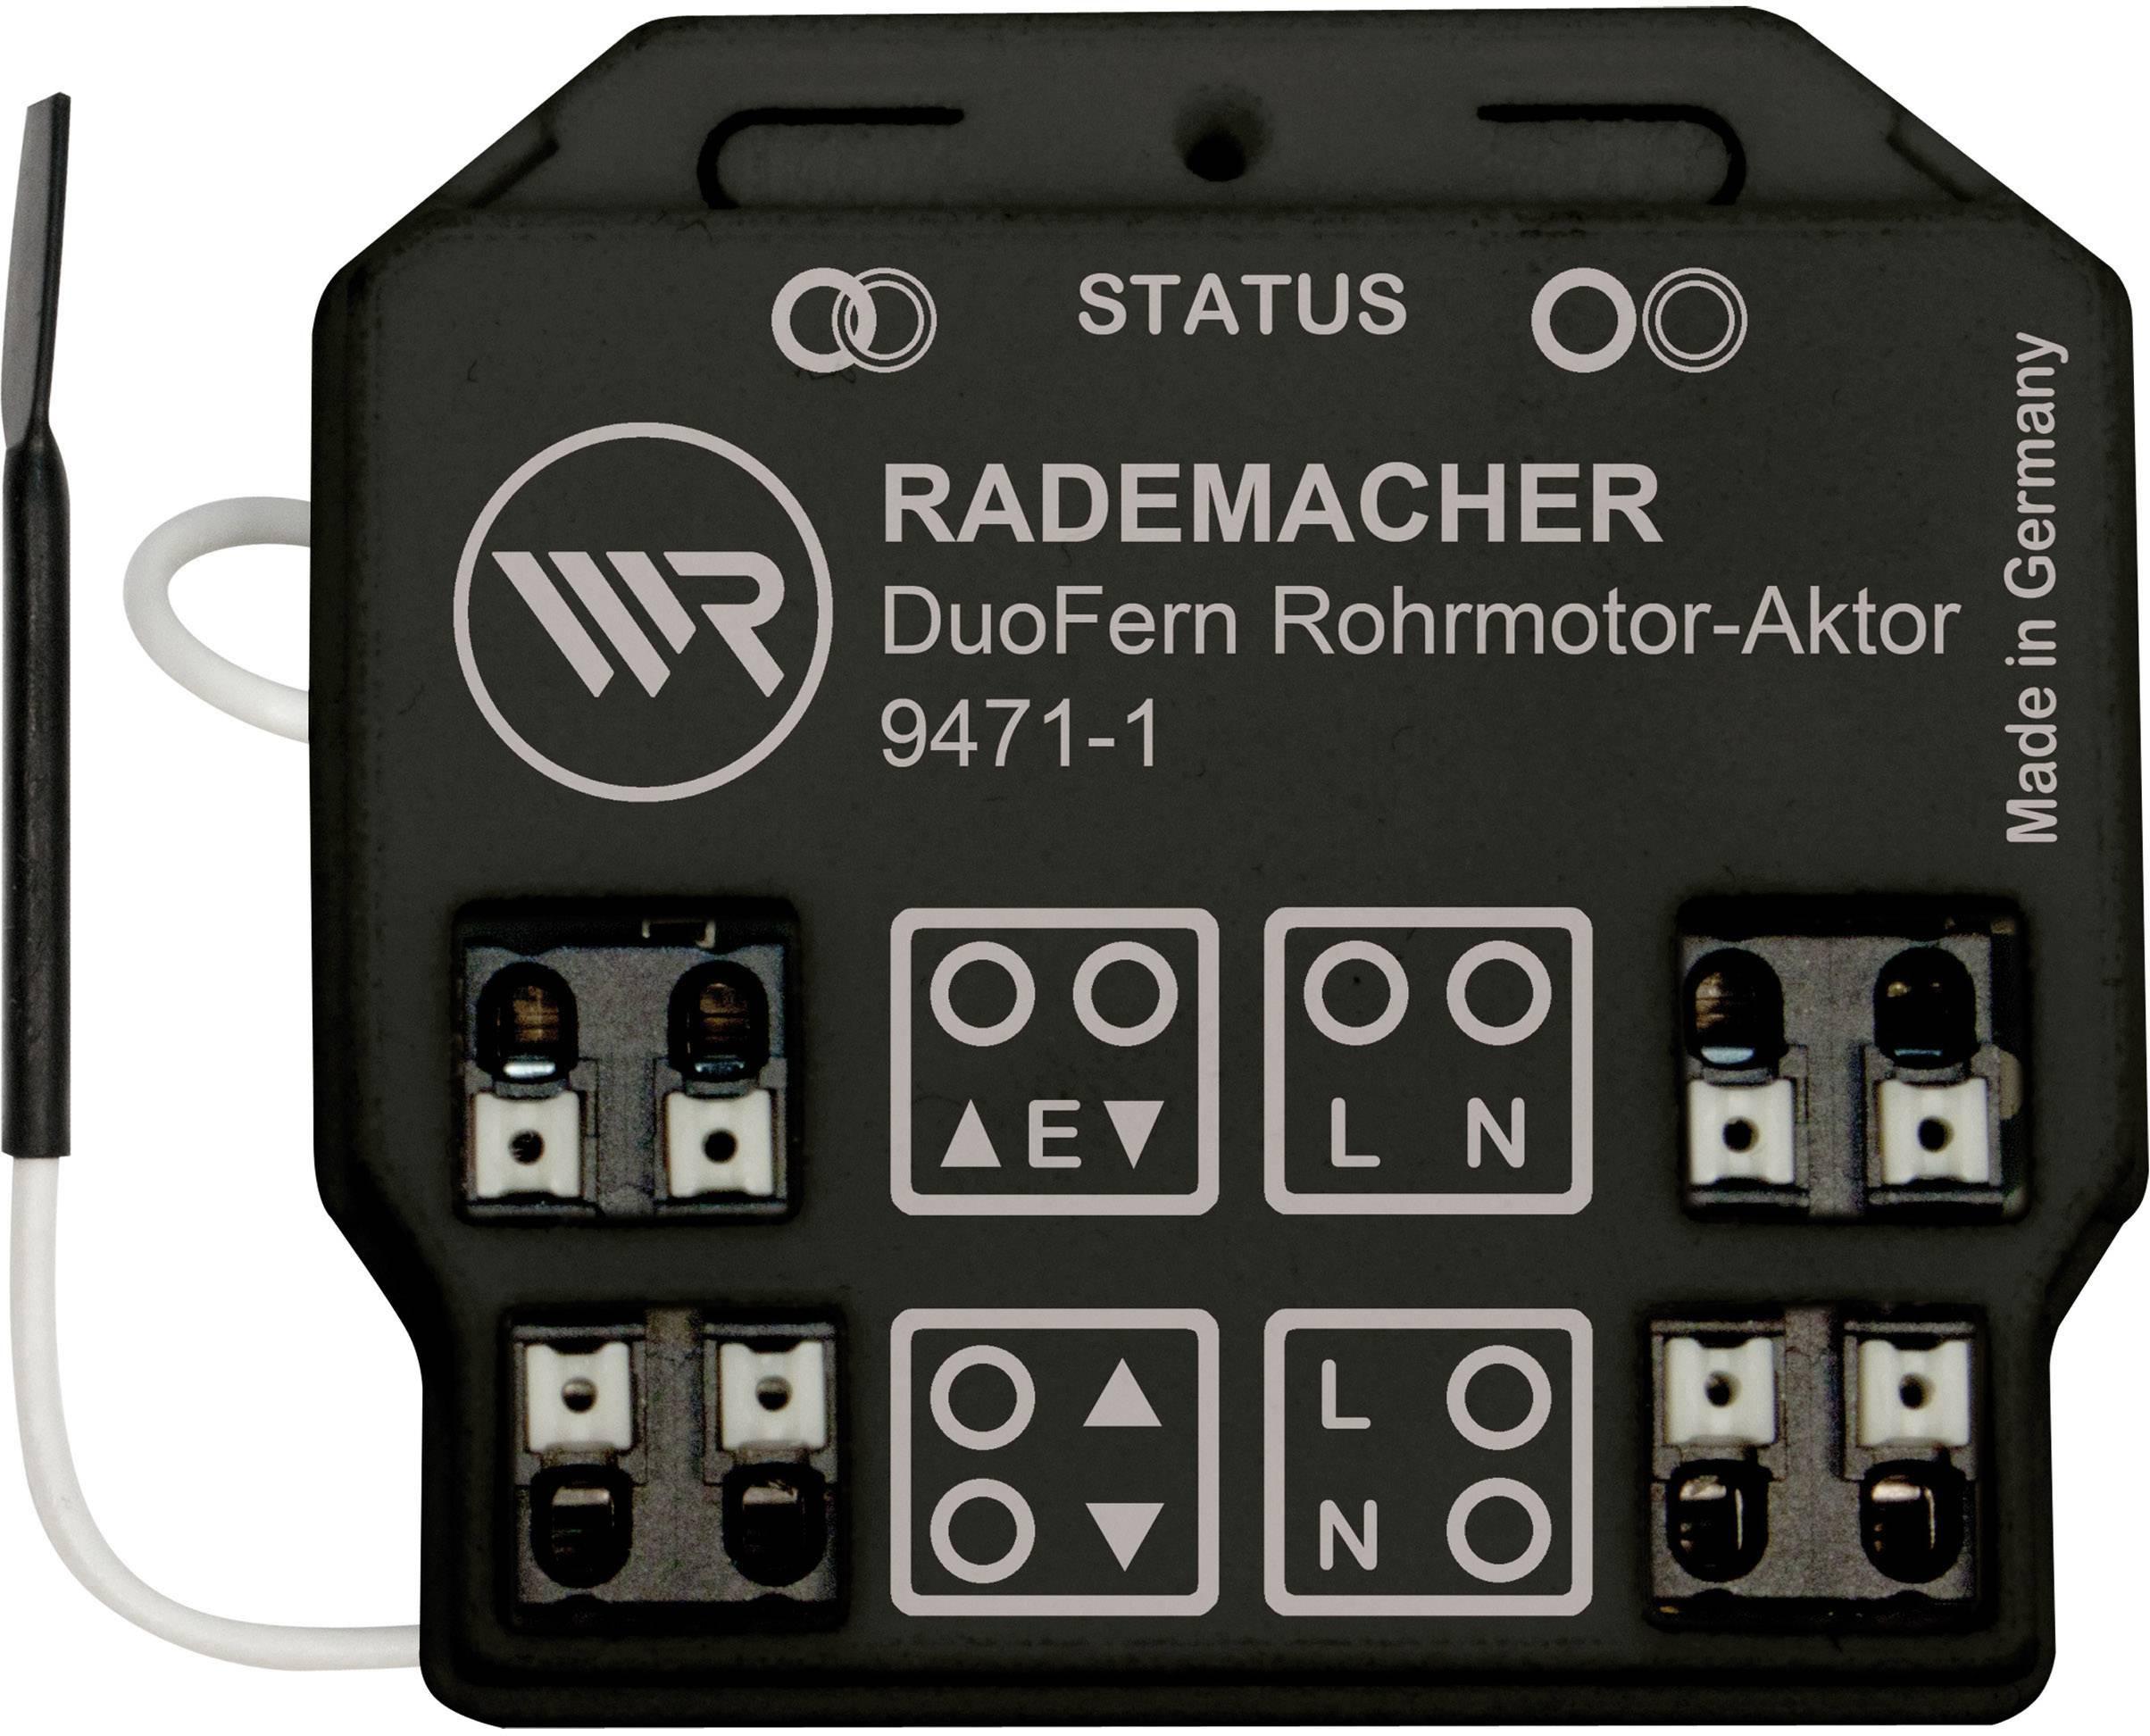 Bezdrôtový spínač roliet pod omietku WR Rademacher Rademacher DuoFern DuoFern 9471-1 35140662, 1-kanálový